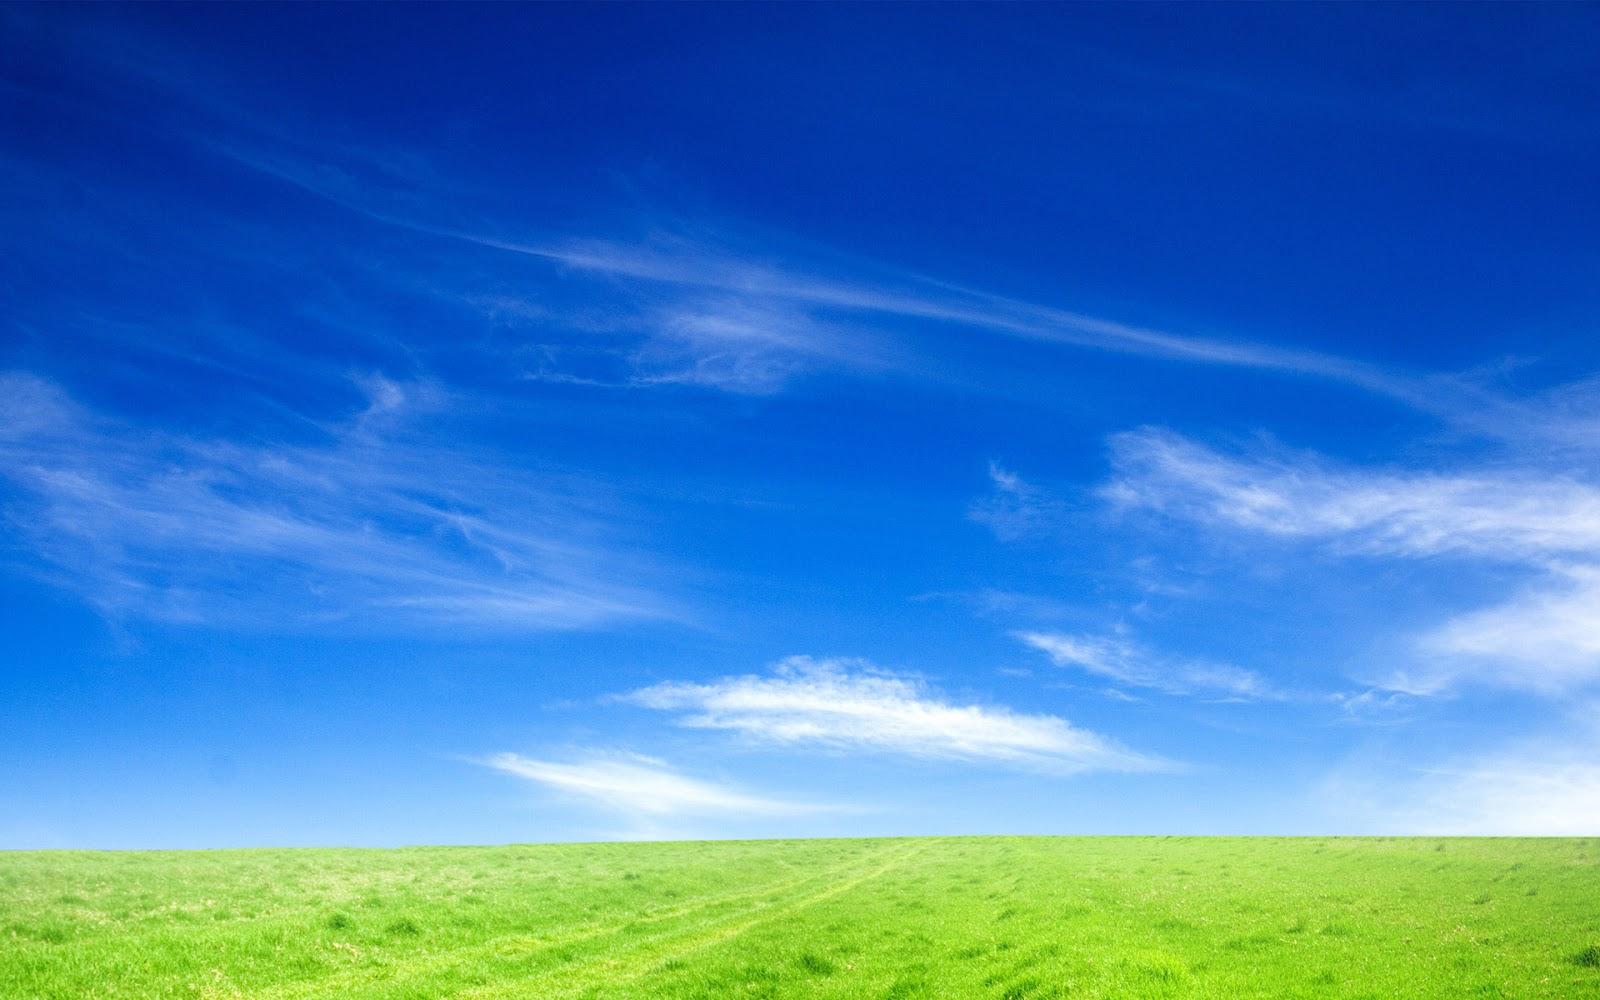 A Blog of One's Own: A Blue True Dream of Sky